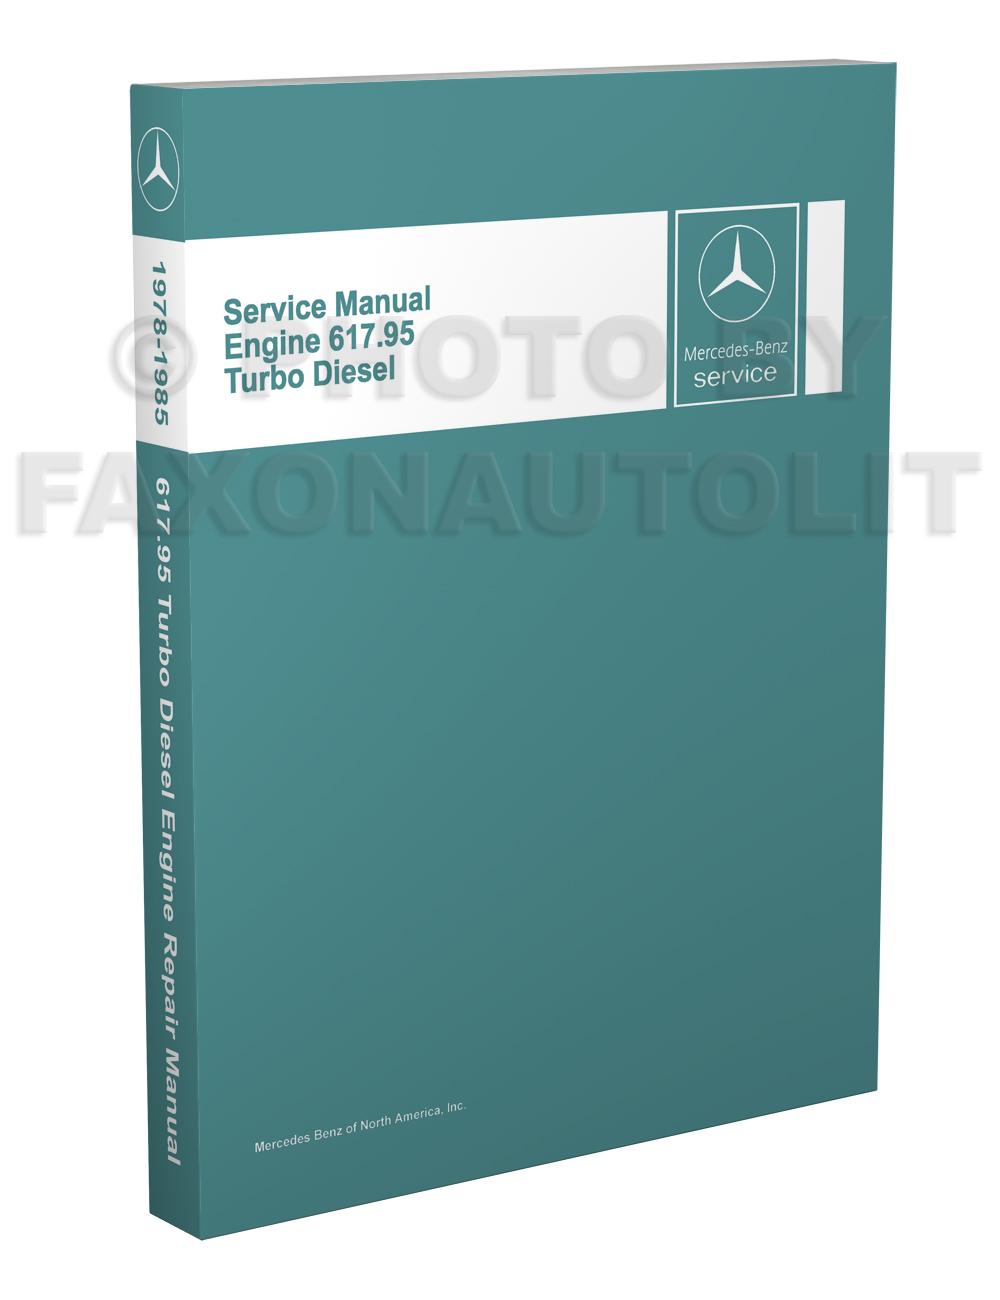 asp manual diesel mercedes engines om service repair and p benz